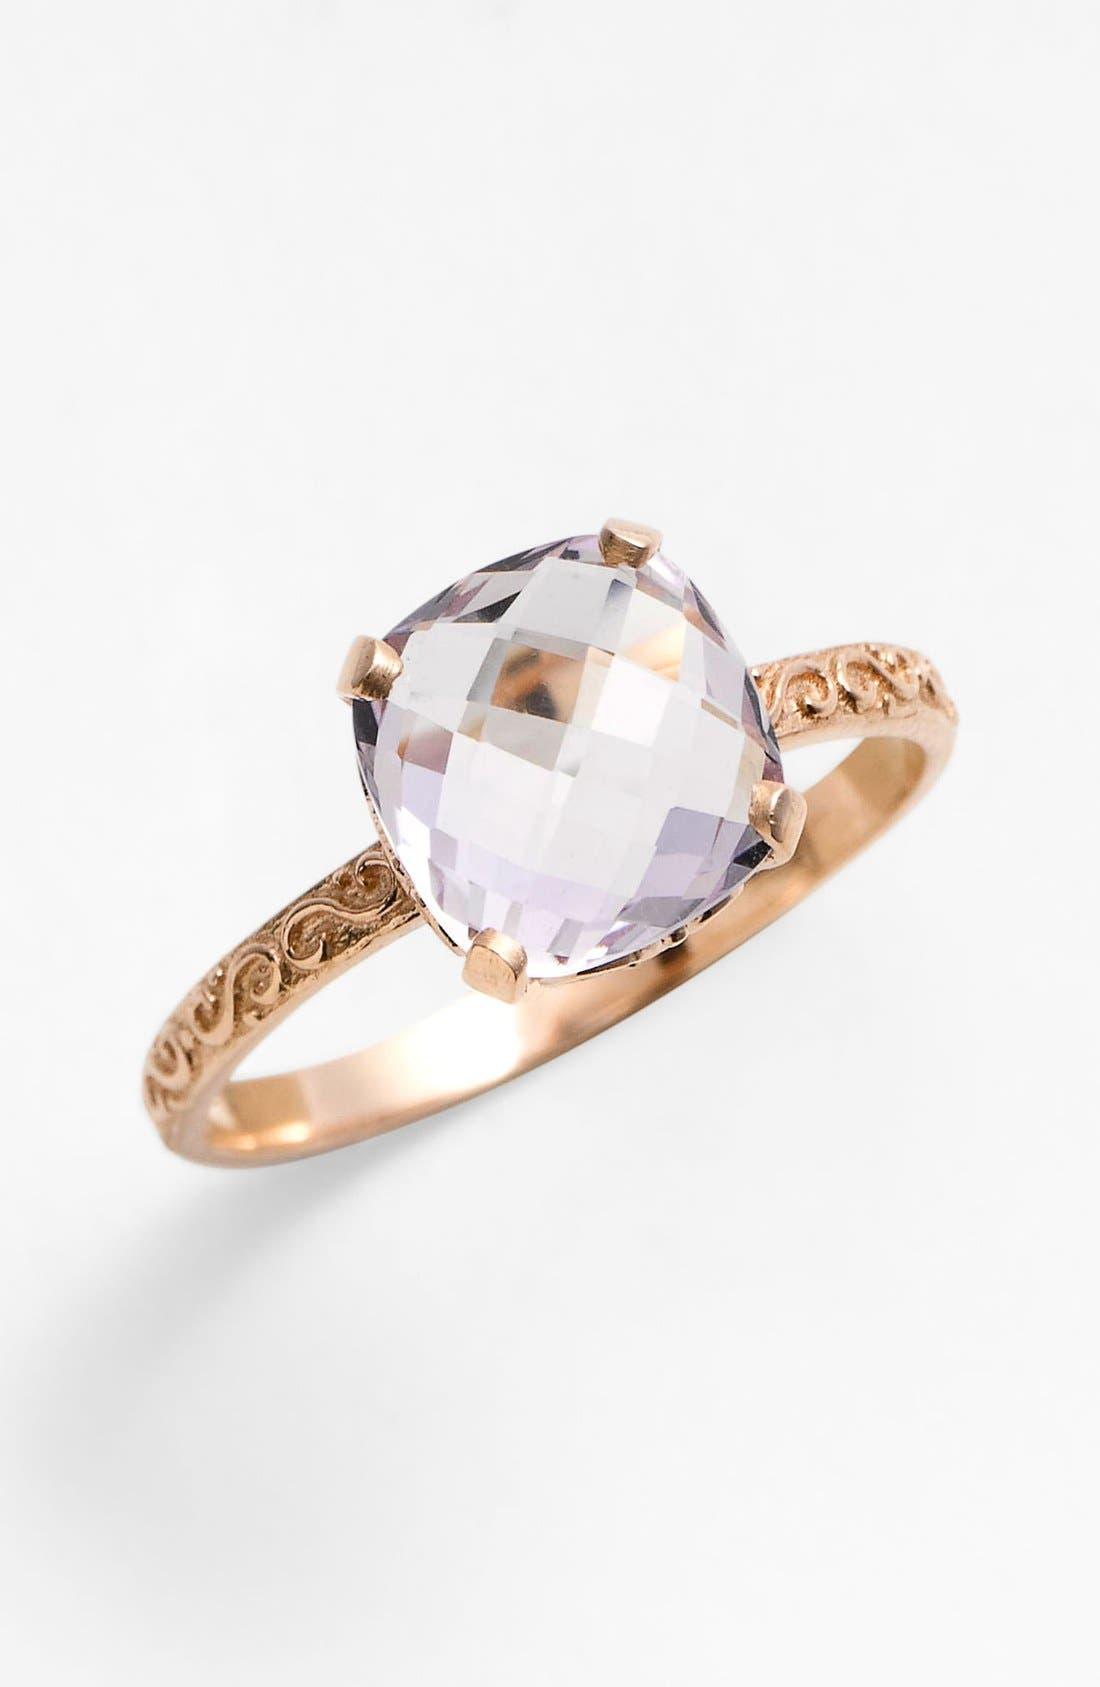 Main Image - KALAN by Suzanne Kalan Cushion Stone Filigree Ring